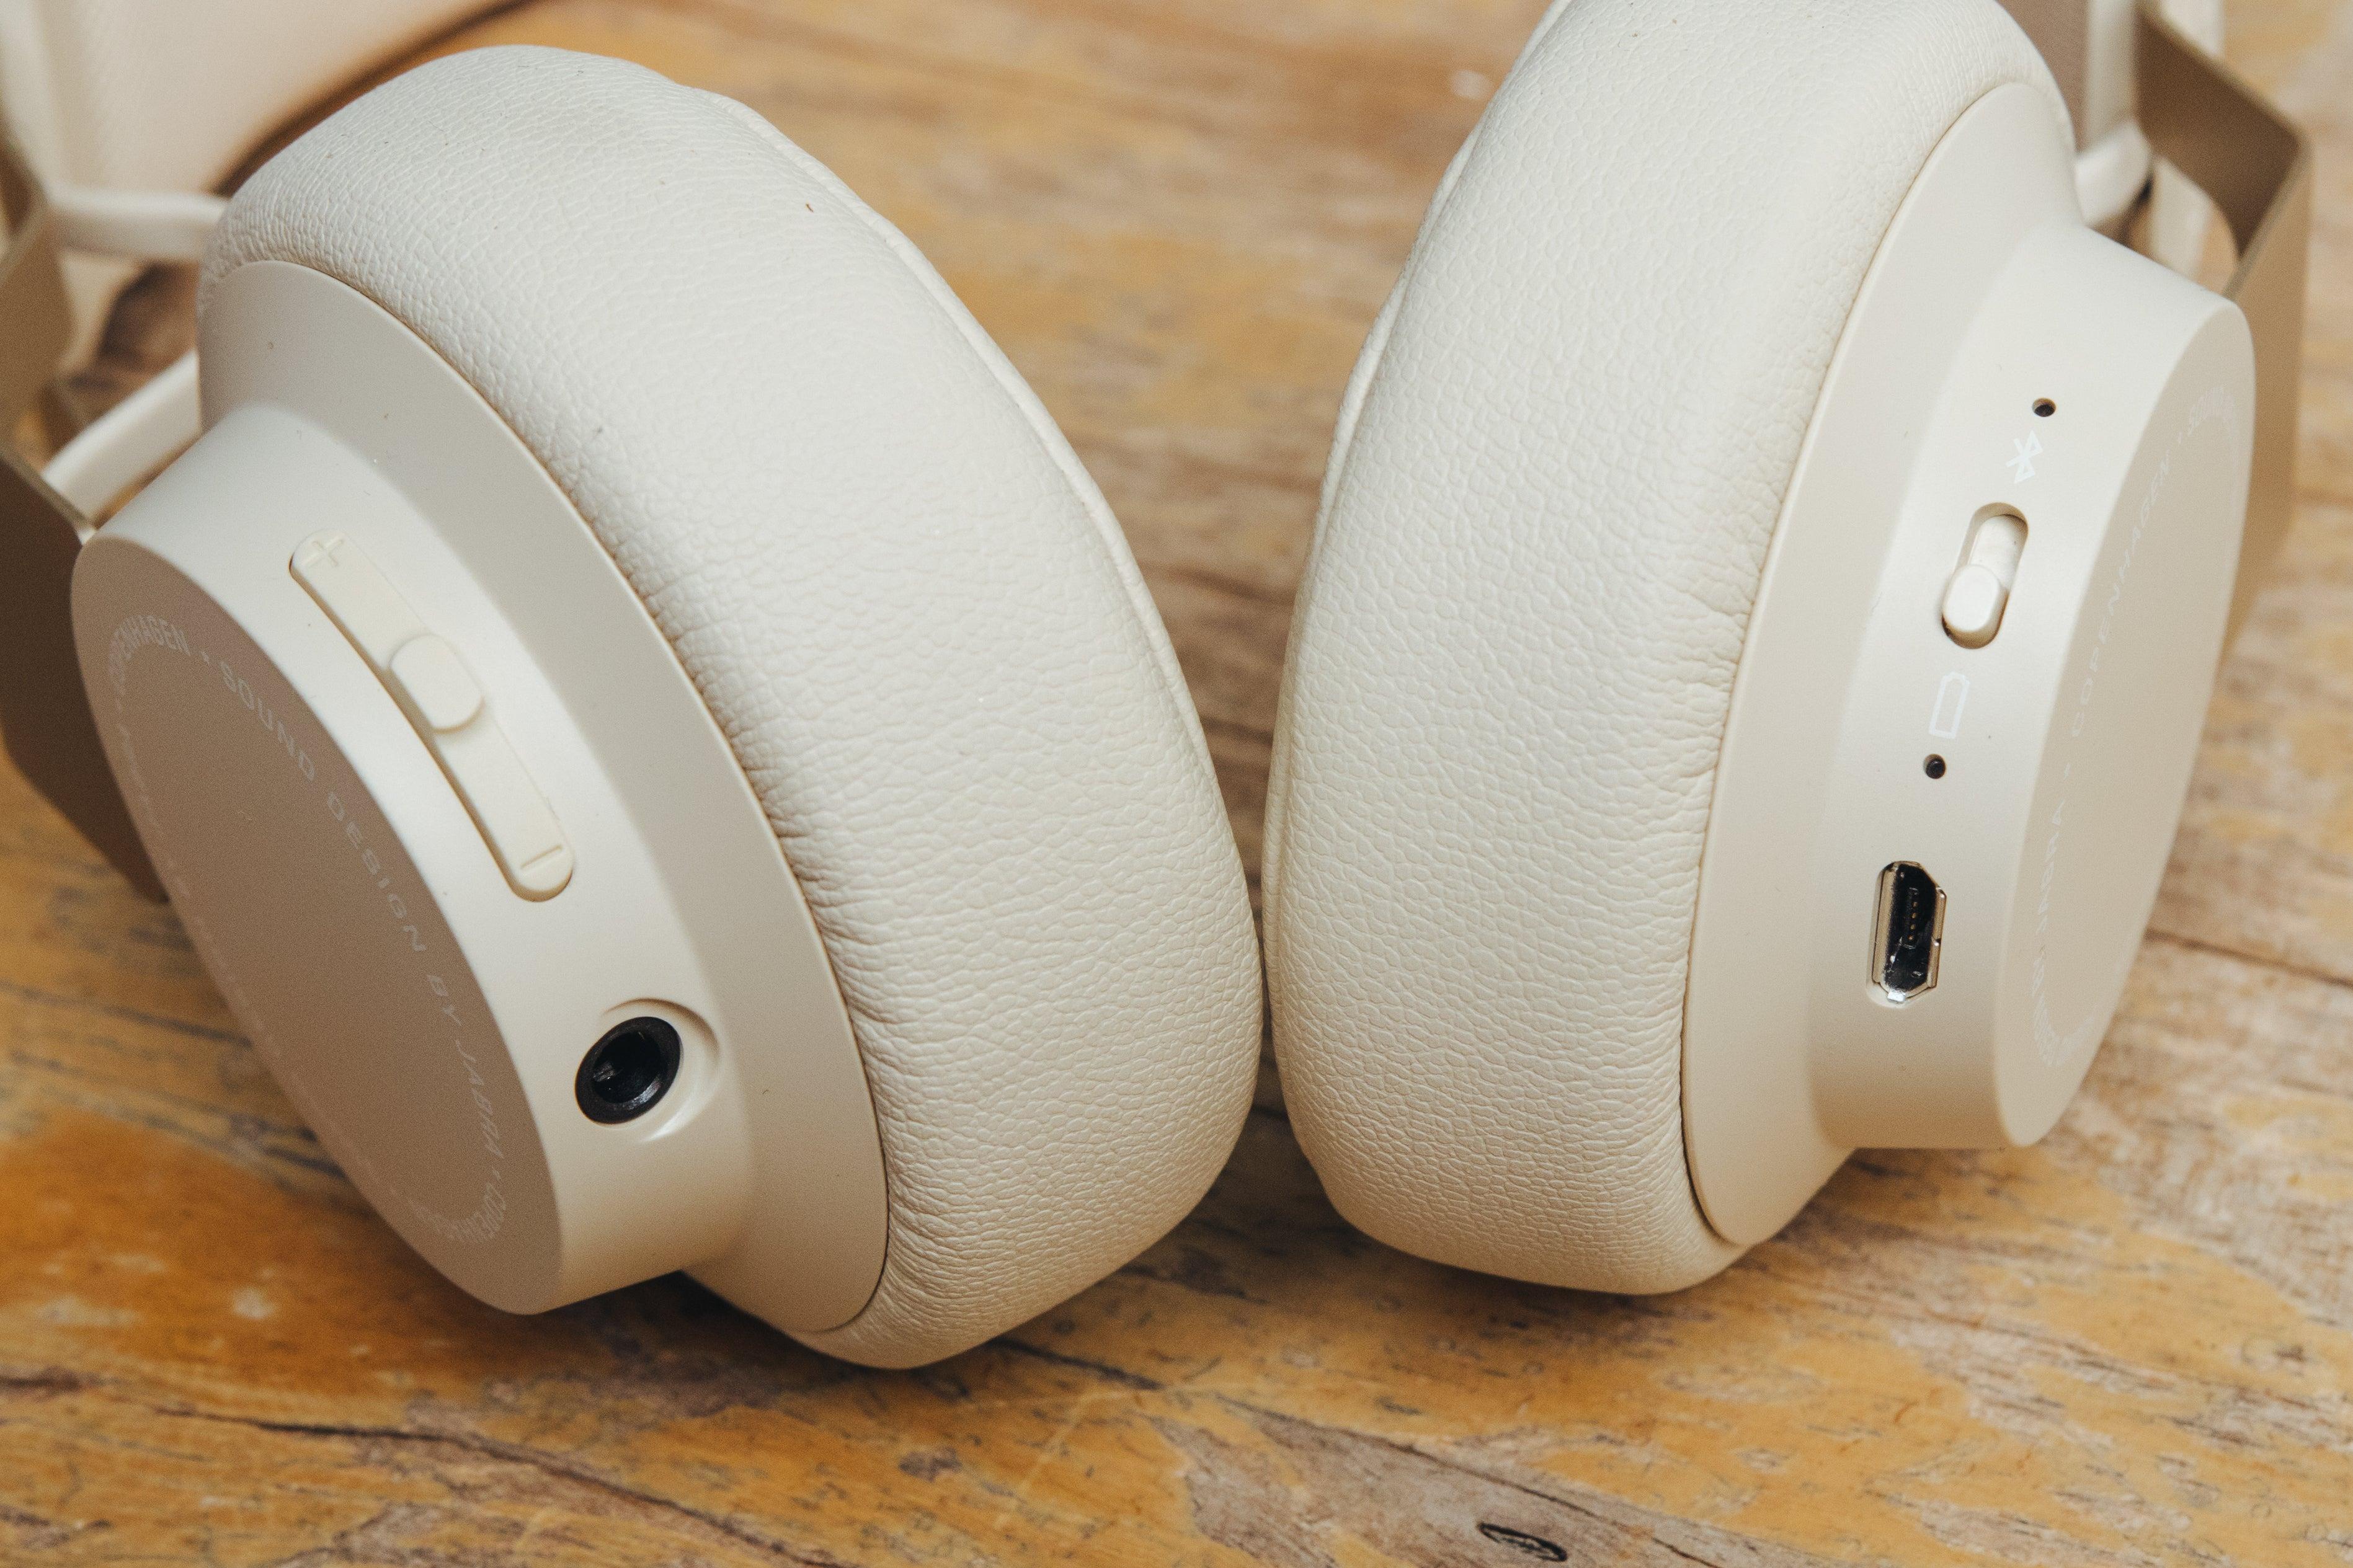 close up of Jabra headphones